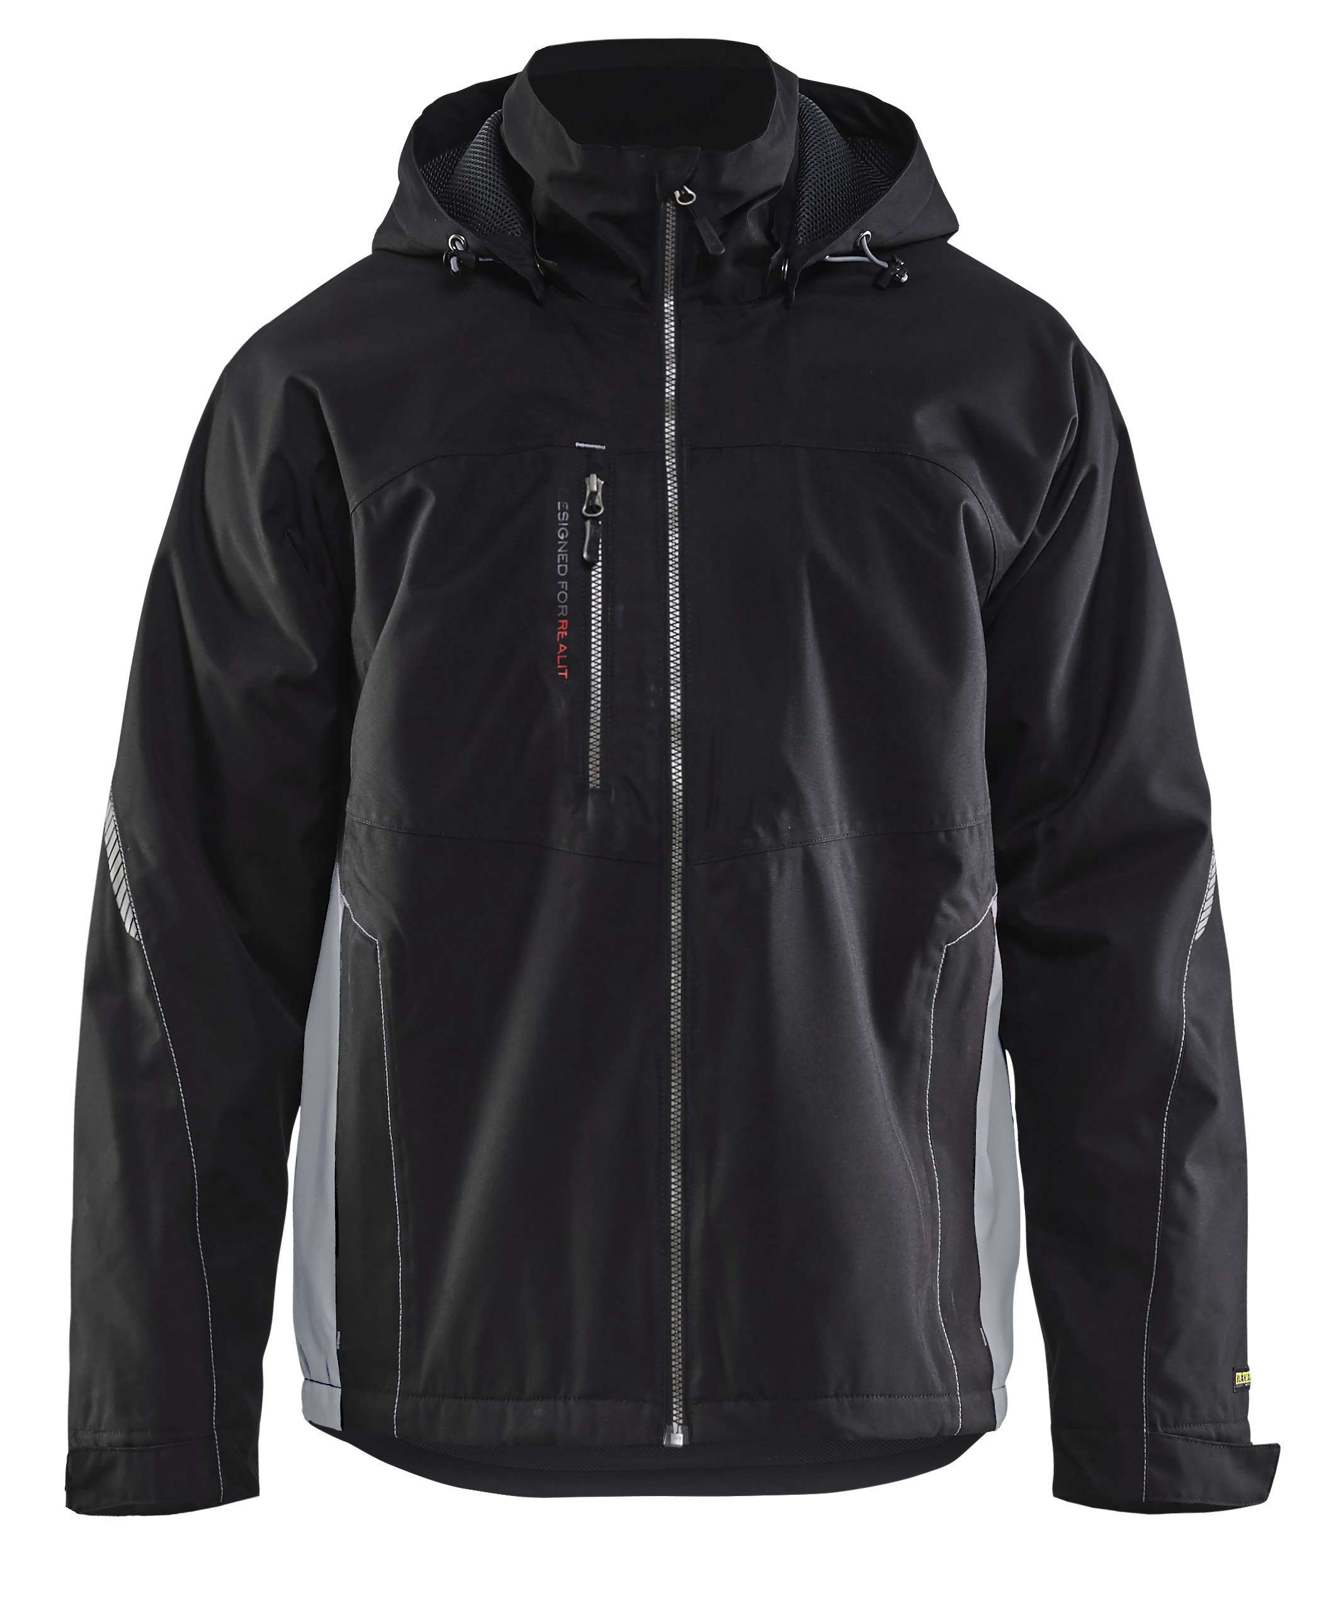 Blaklader Regenjacks 47901977 zwart-grijs(9994)